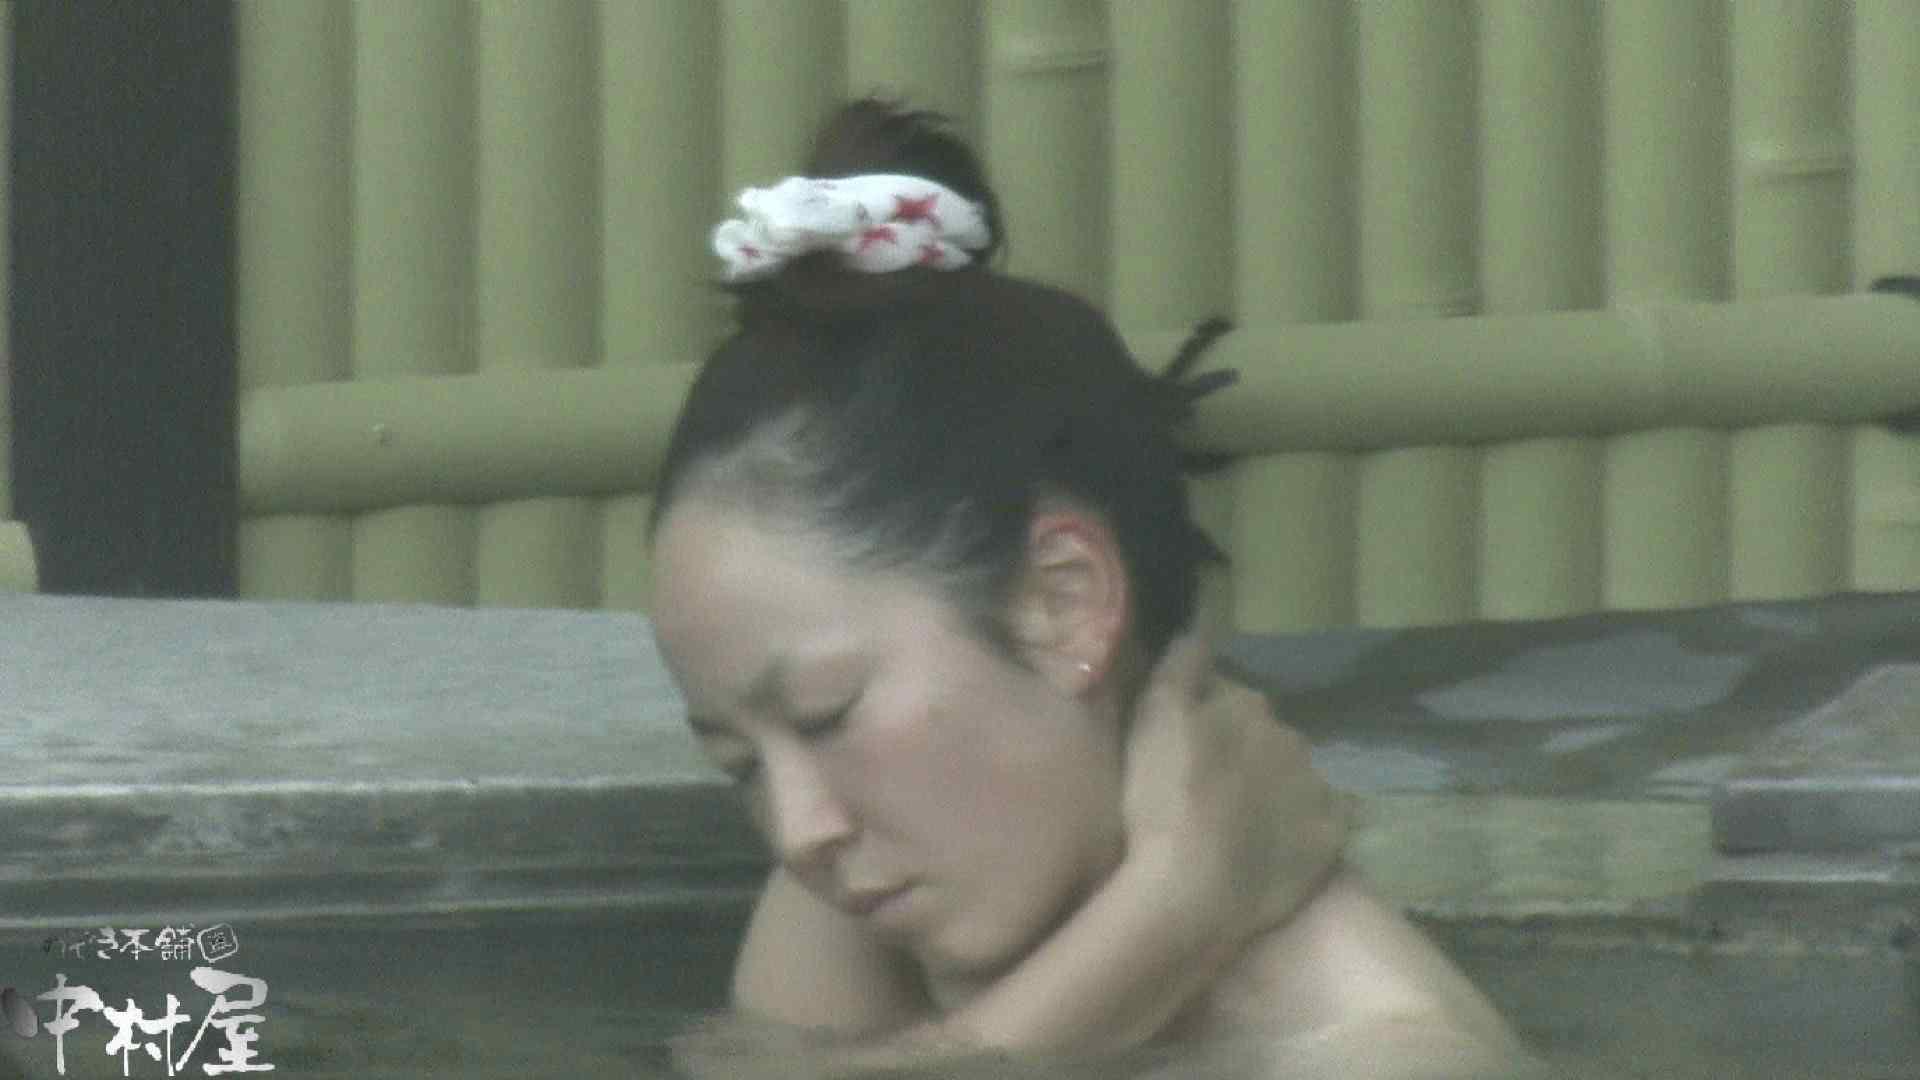 Aquaな露天風呂Vol.911 0  88連発 68